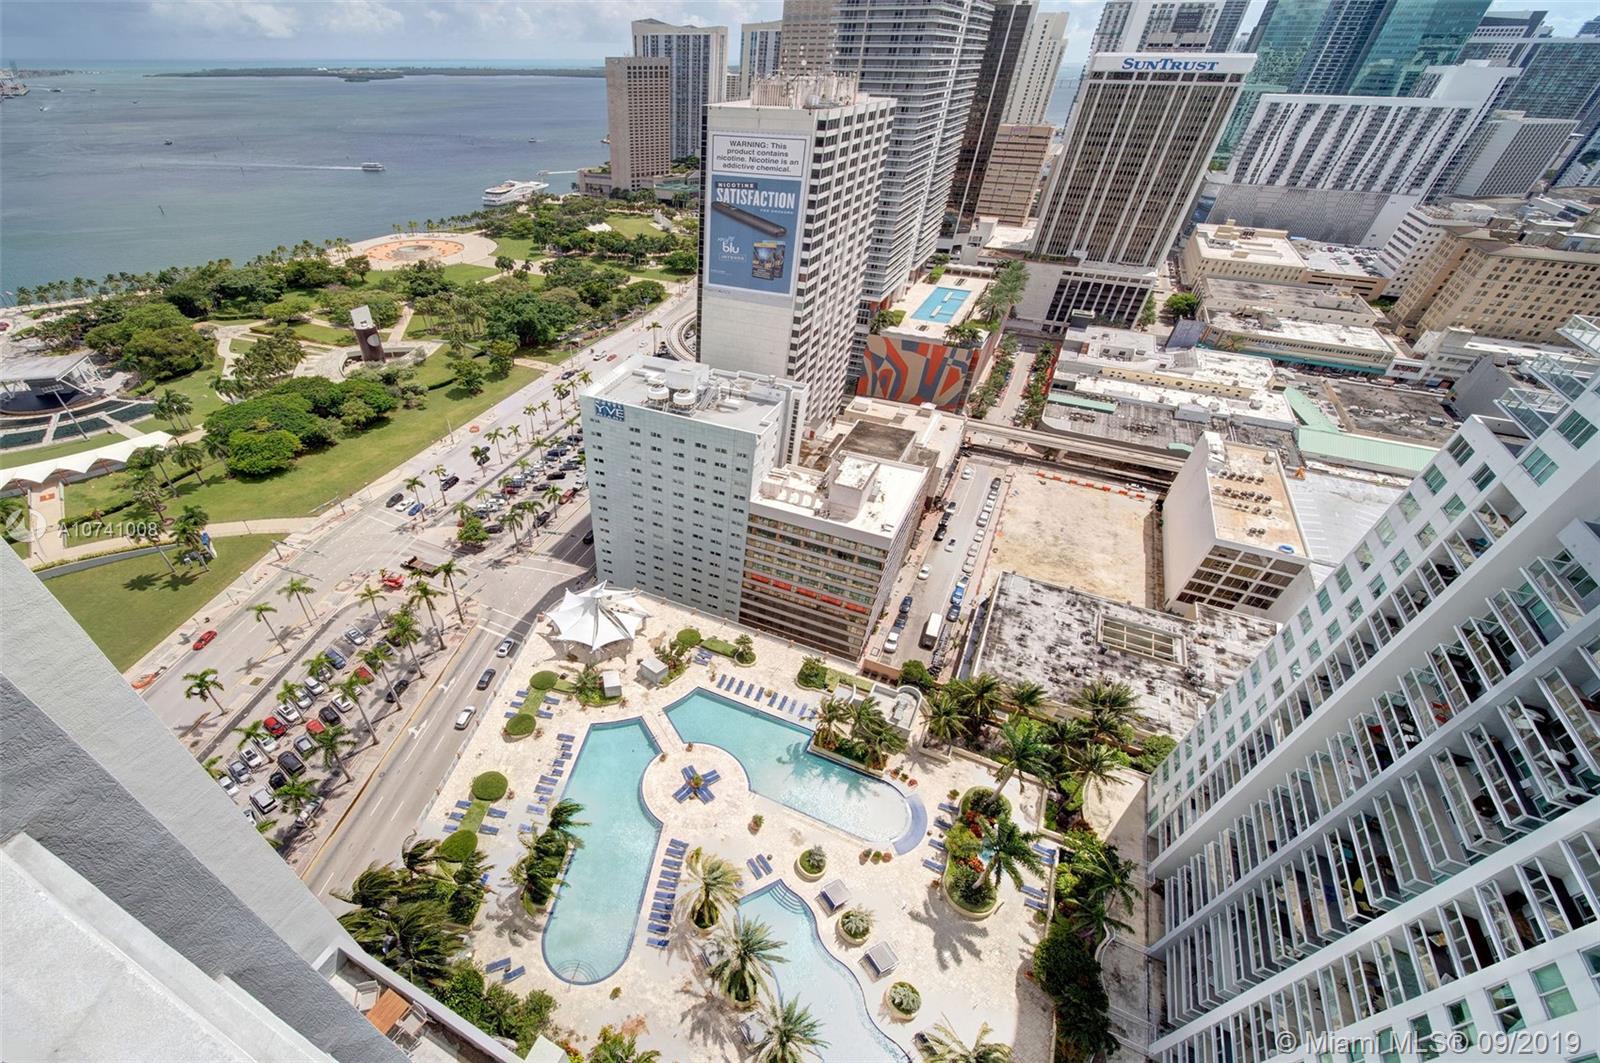 Vizcayne One #3607 - 244 Biscayne Blvd #3607, Miami, FL 33132